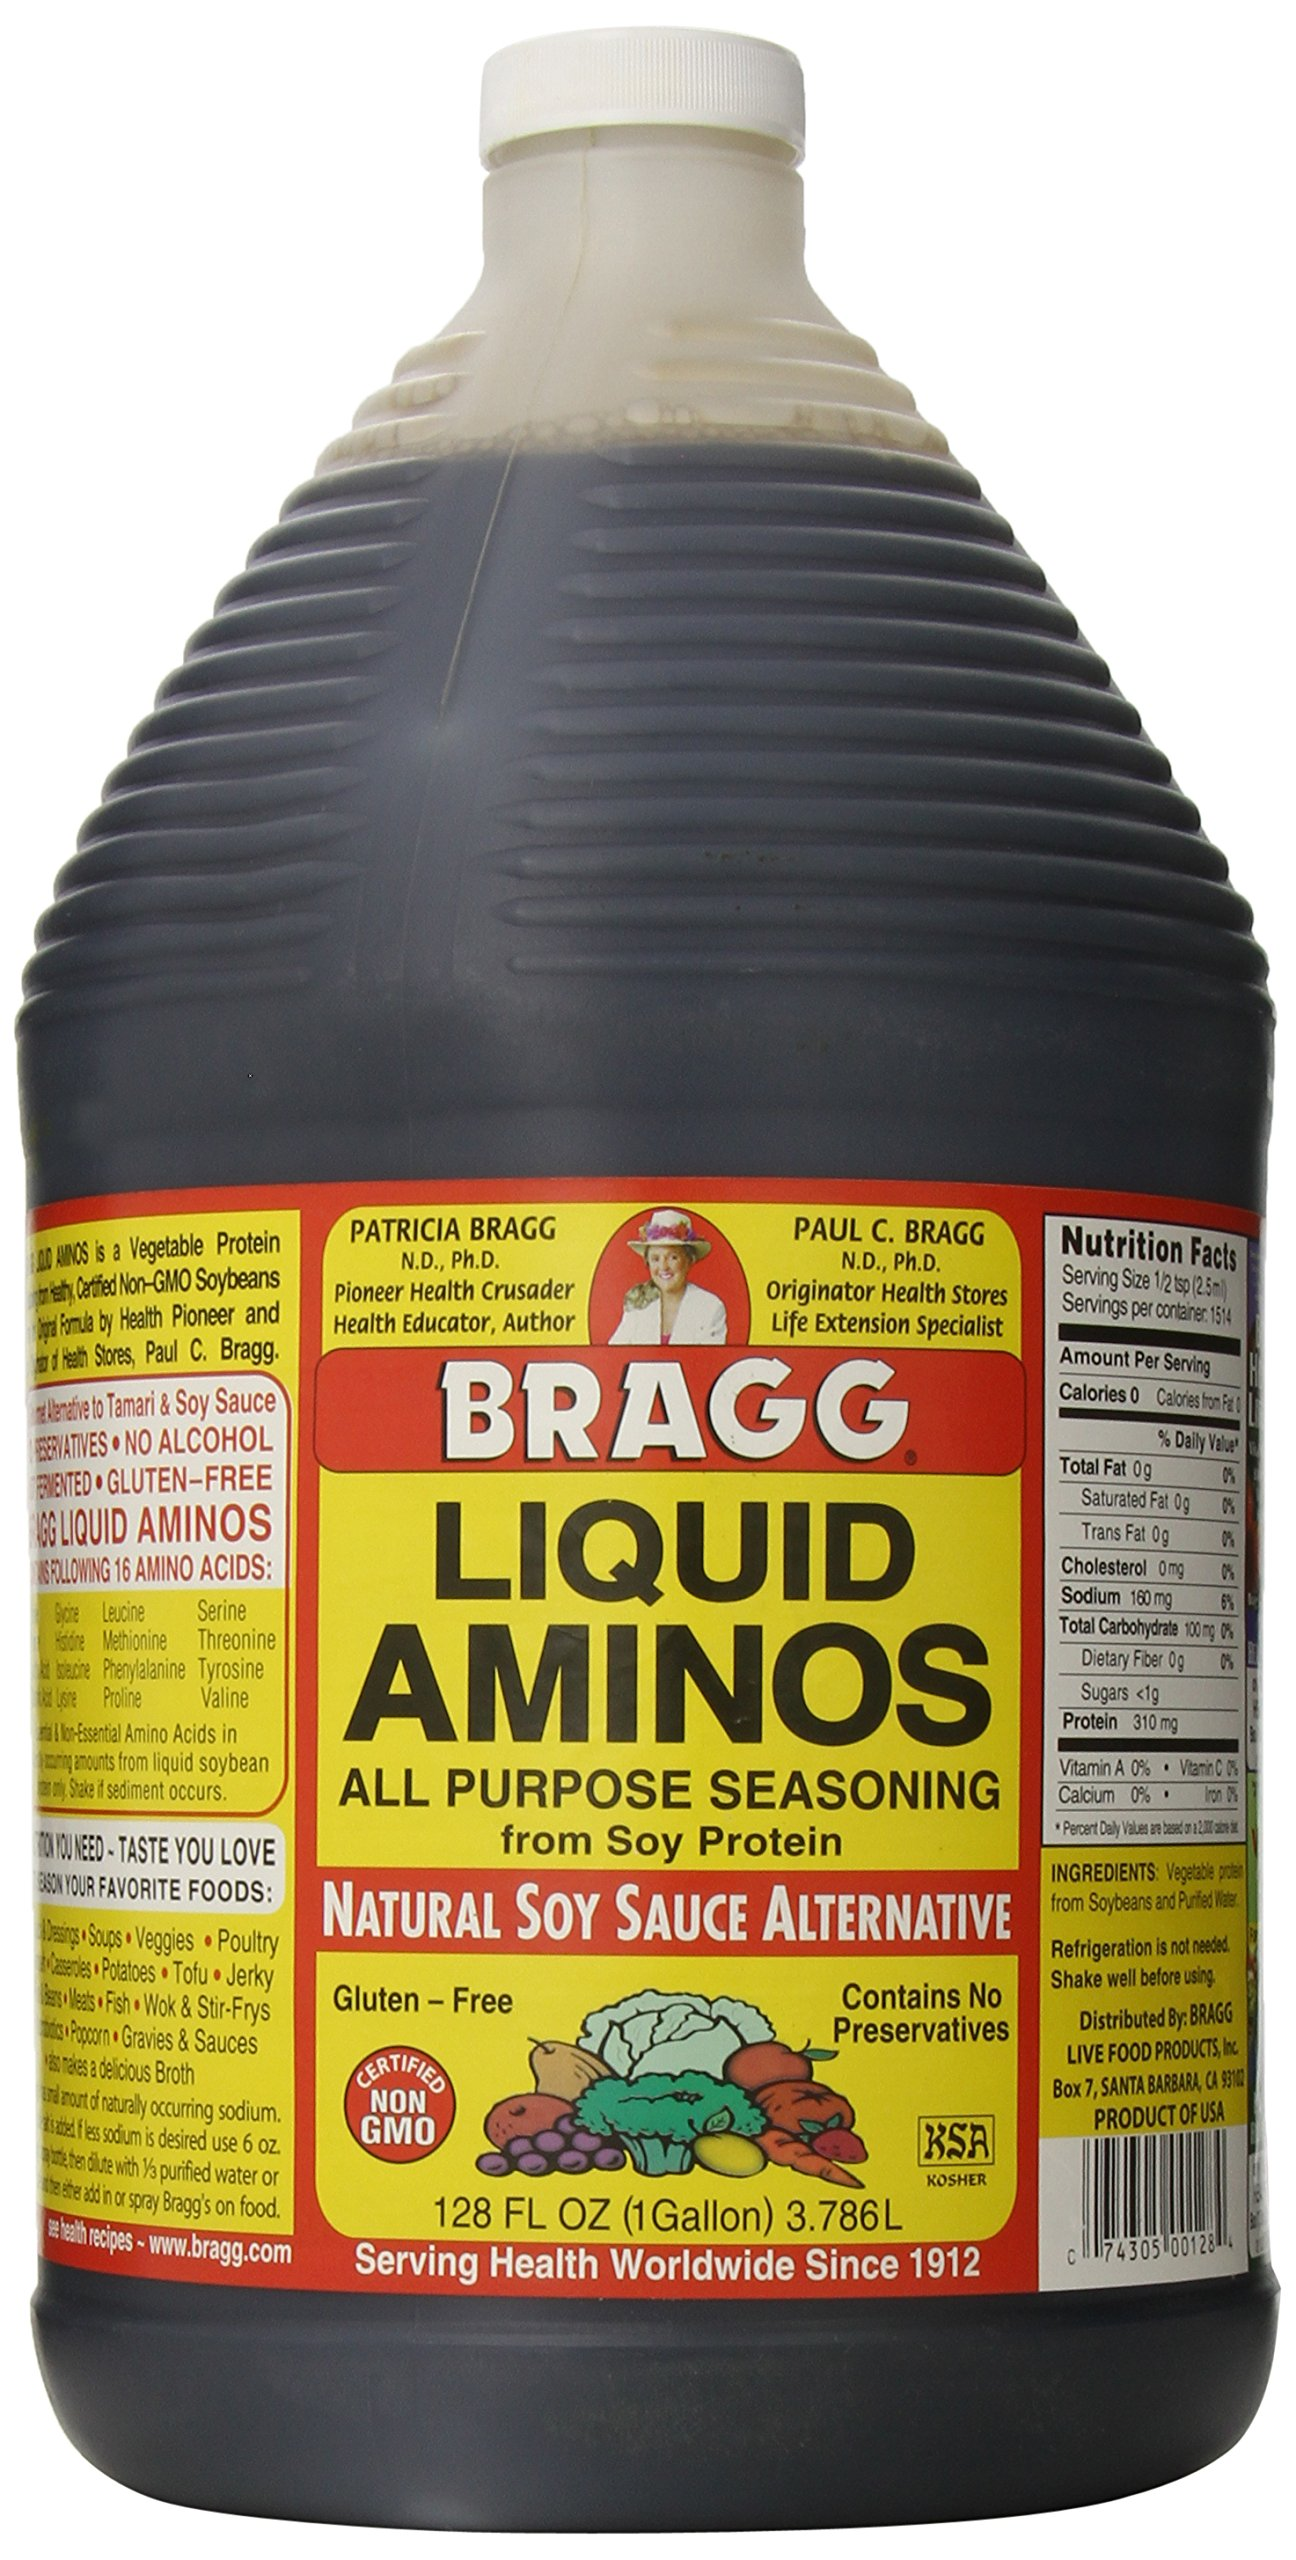 Bragg Liquid Aminos 1 Gallon